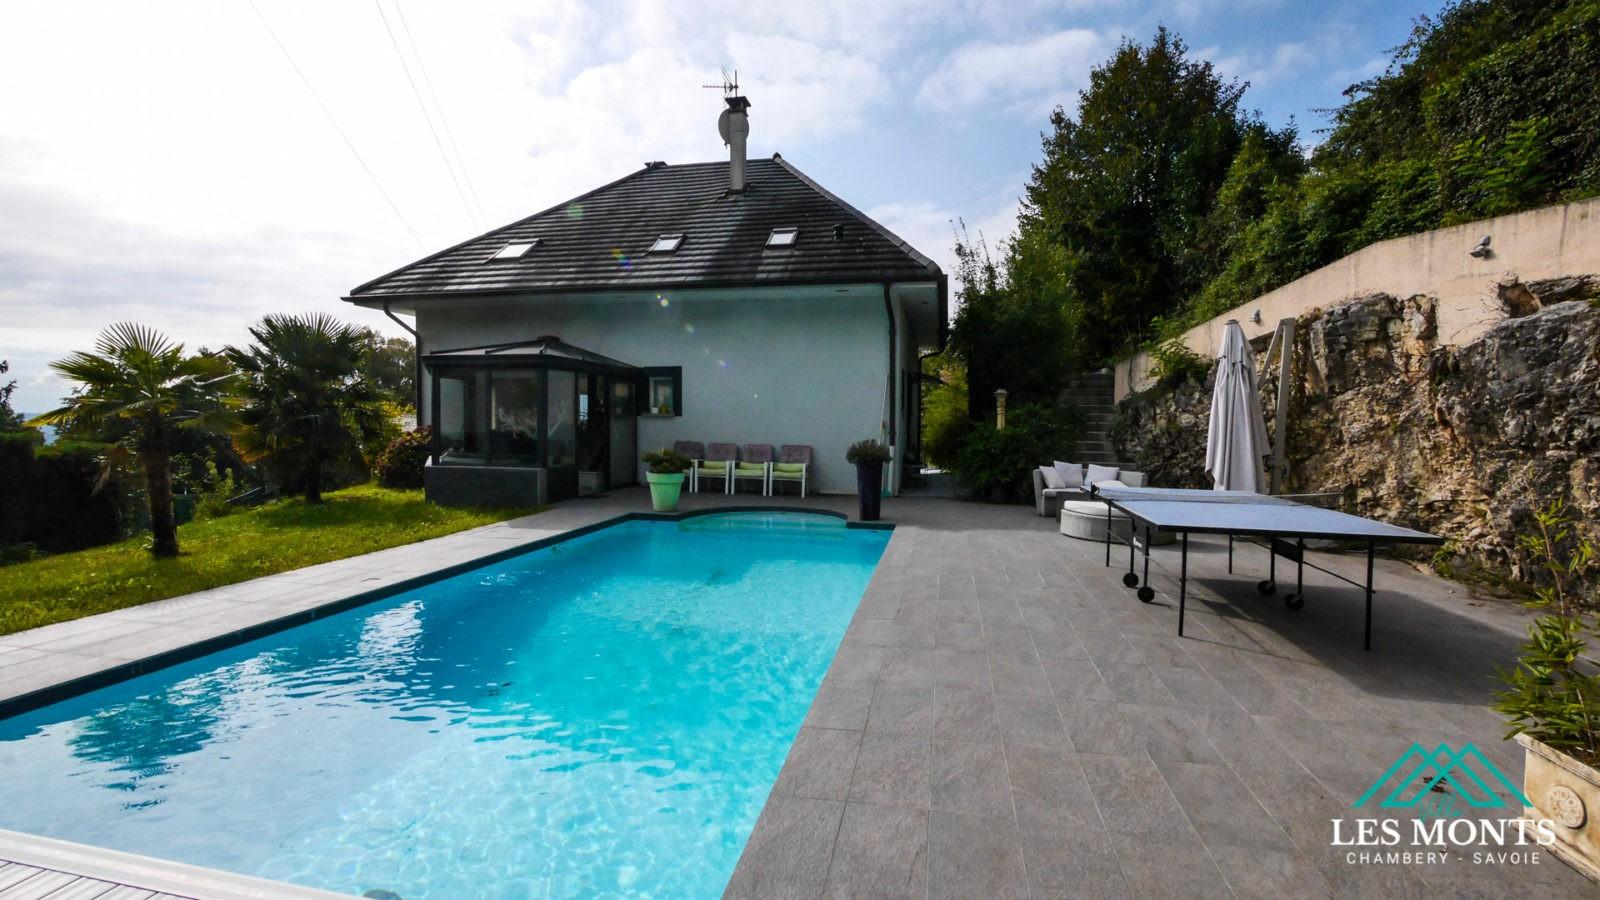 Photographie immobilère - Chambéry Savoie